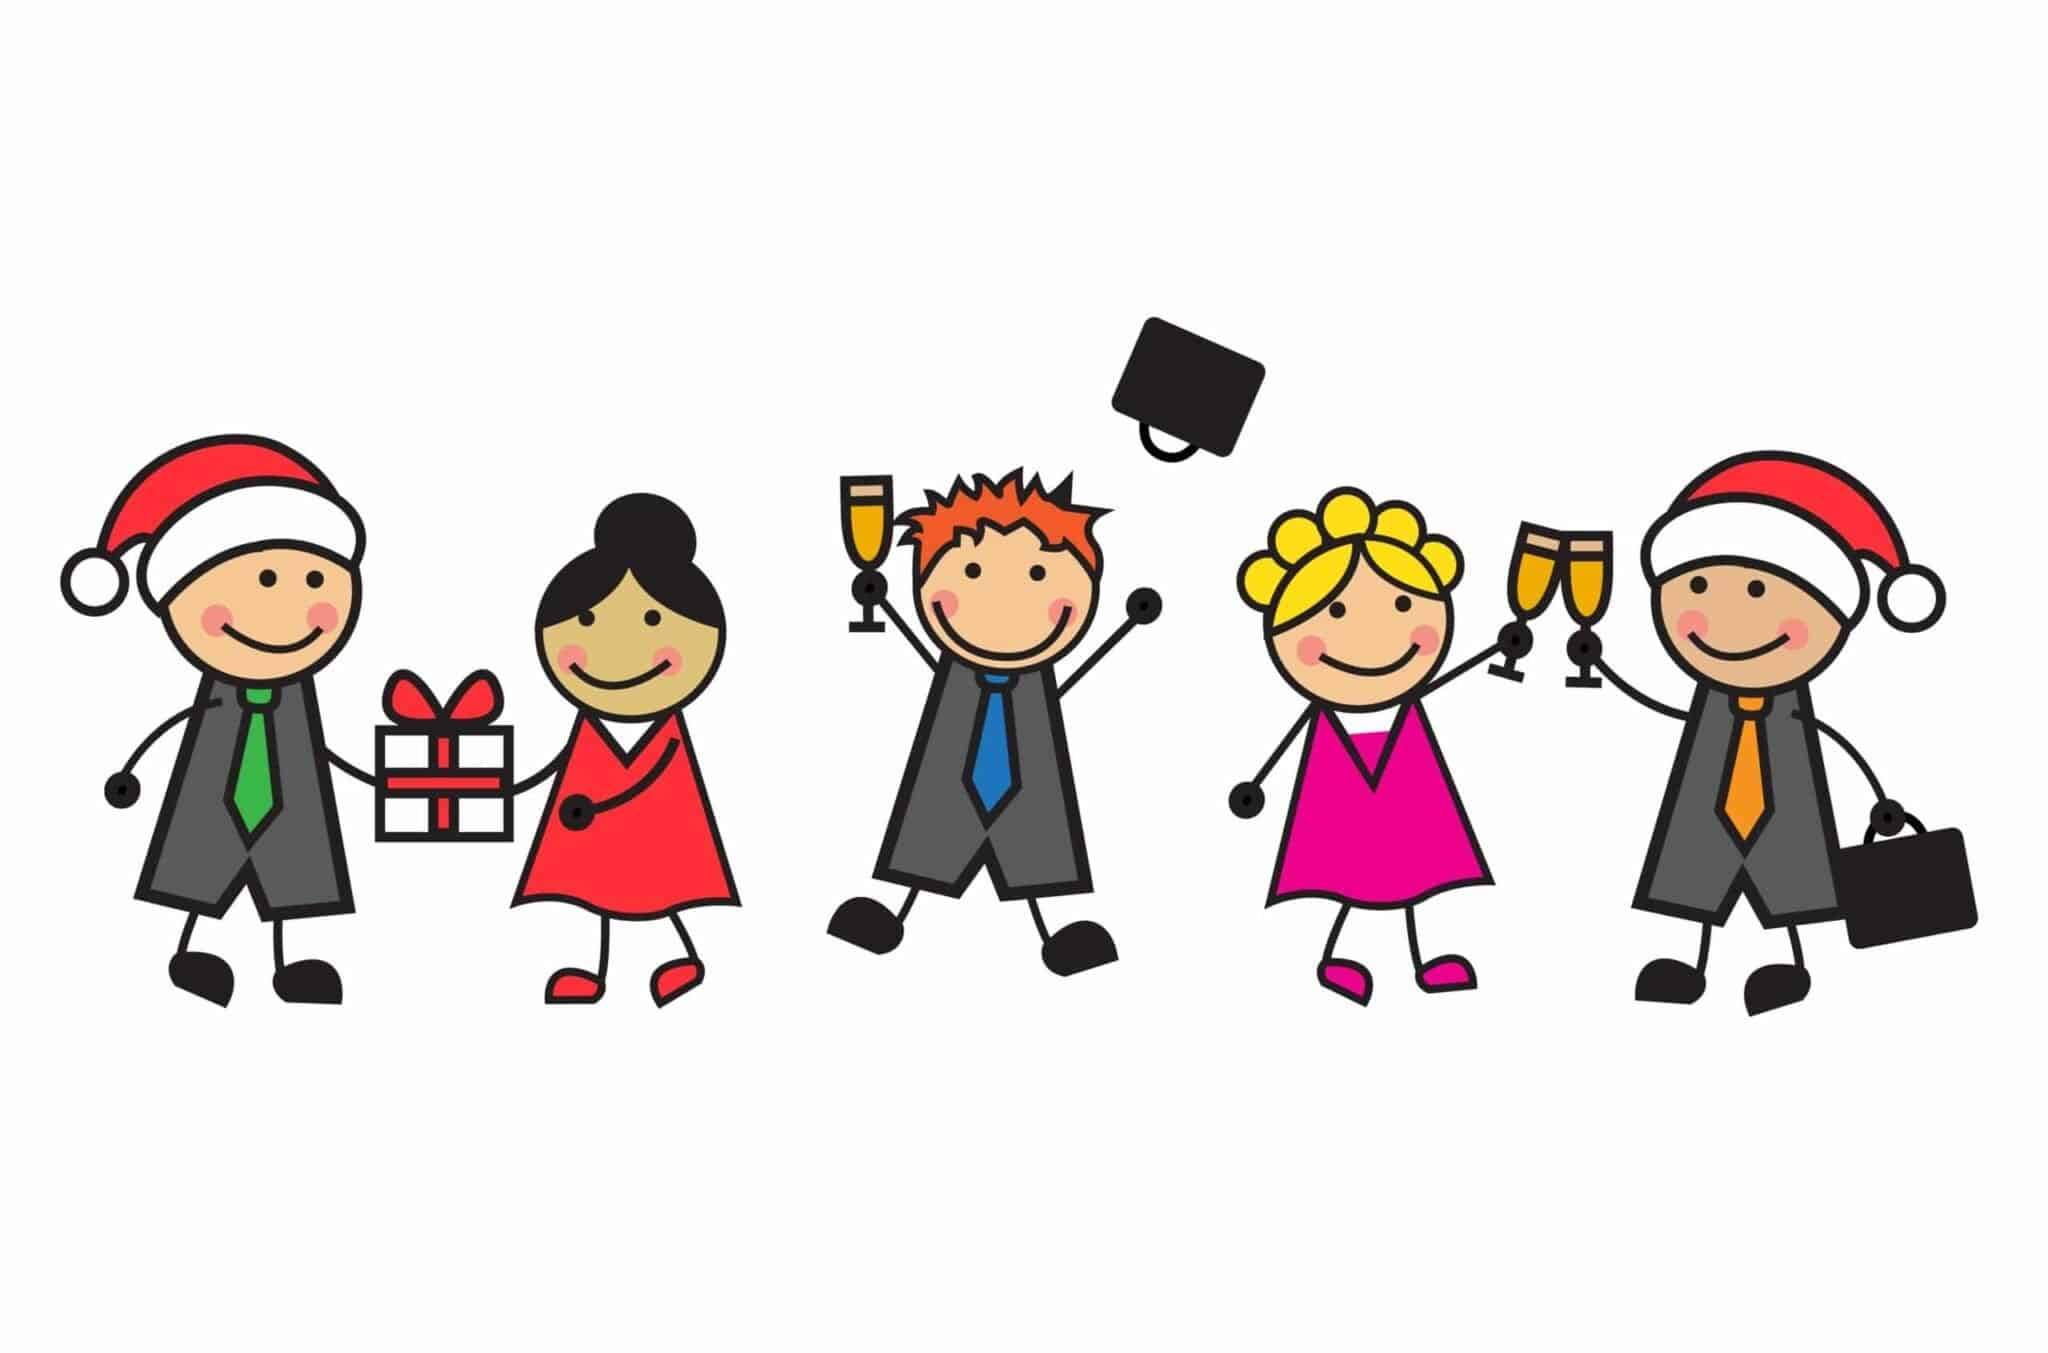 5 cartoon figures celebrating Christmas at work